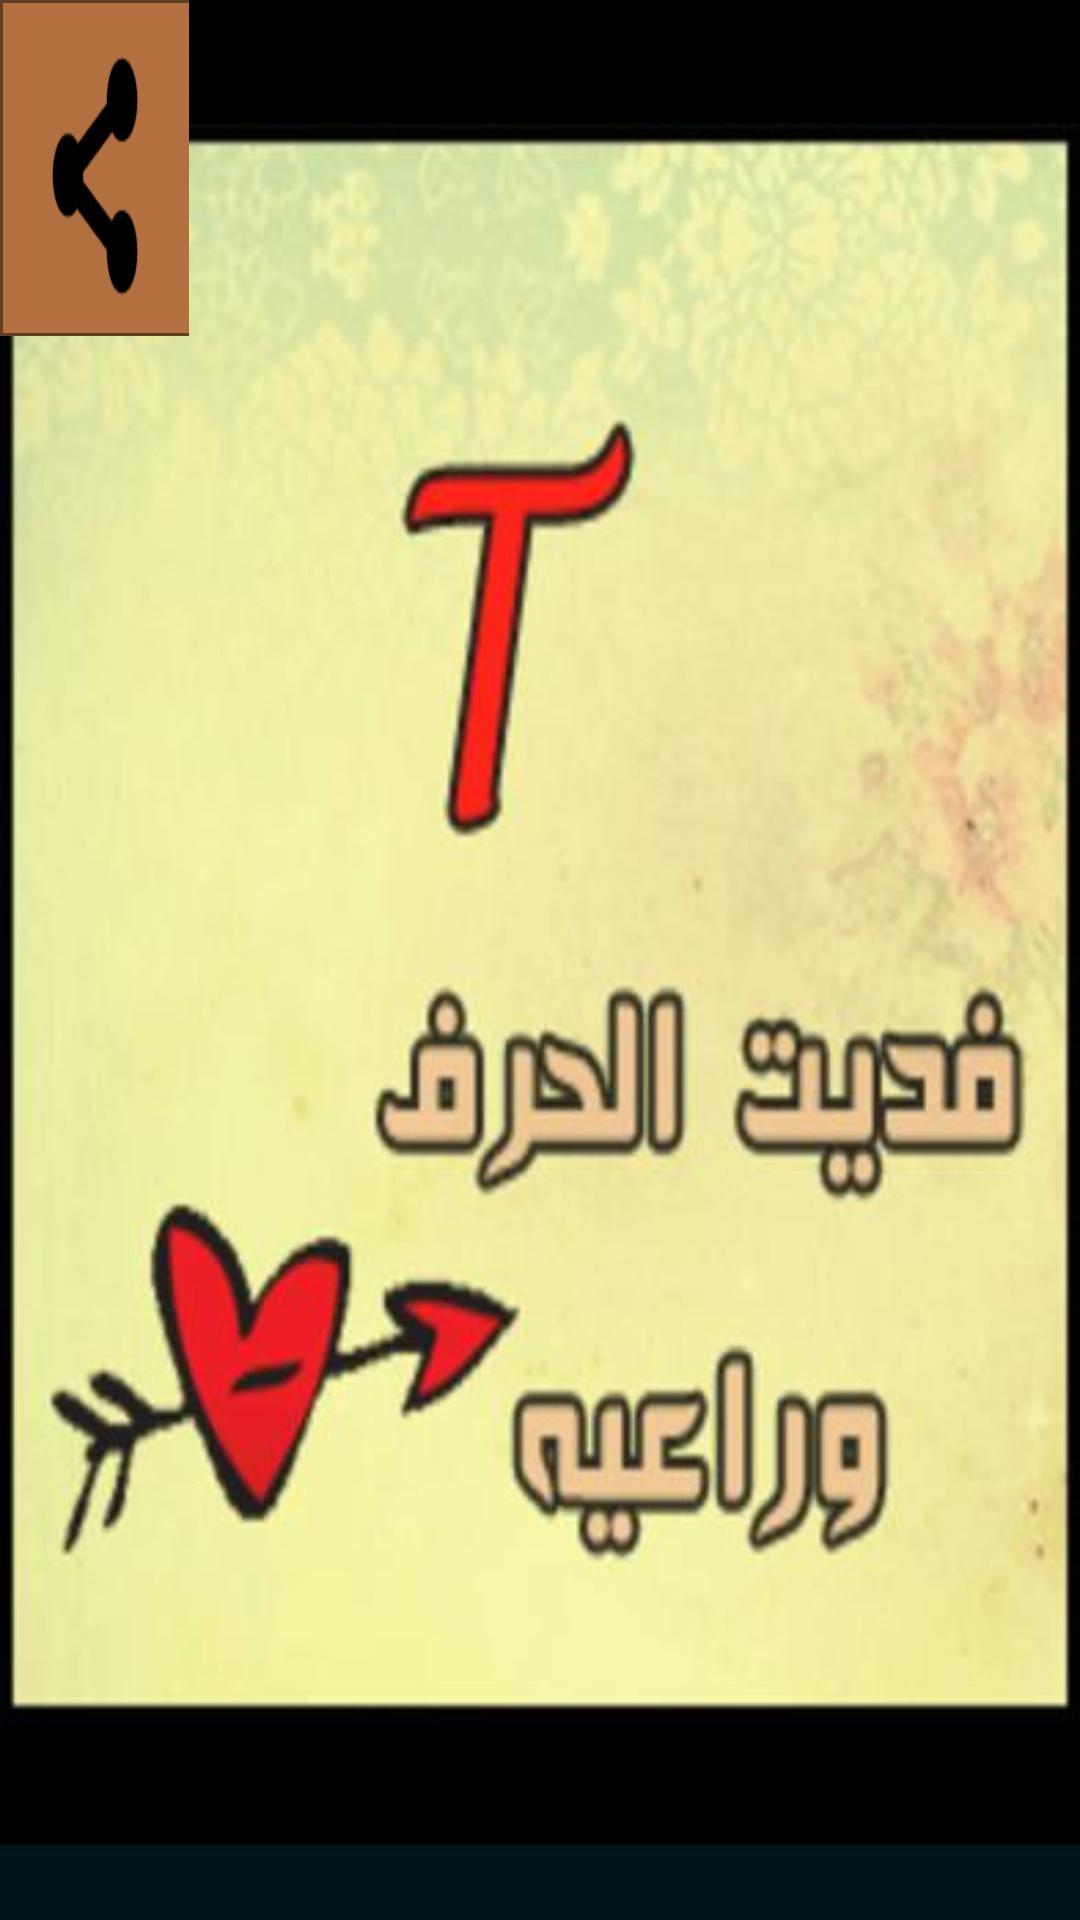 صورة صور حرف t , صور مطبوعه لحرف t جديده